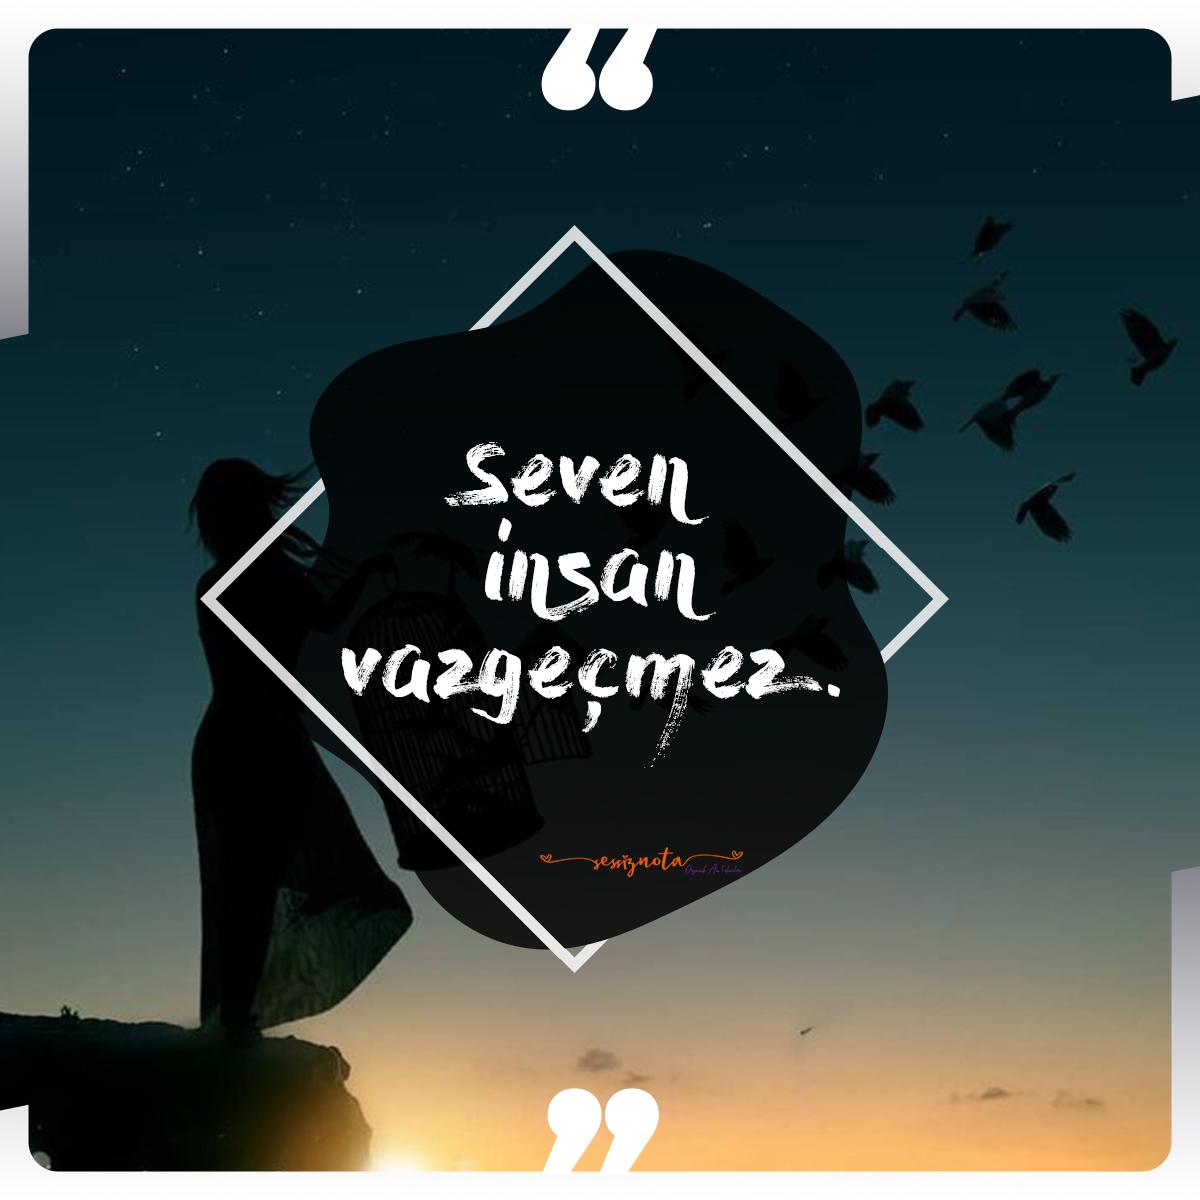 Seven insan vazgeçmez - Resimli Kısa Aşk Sözleri - Etkileyici, Duygusal Kısa Aşk Sözleri, resimli-sozler